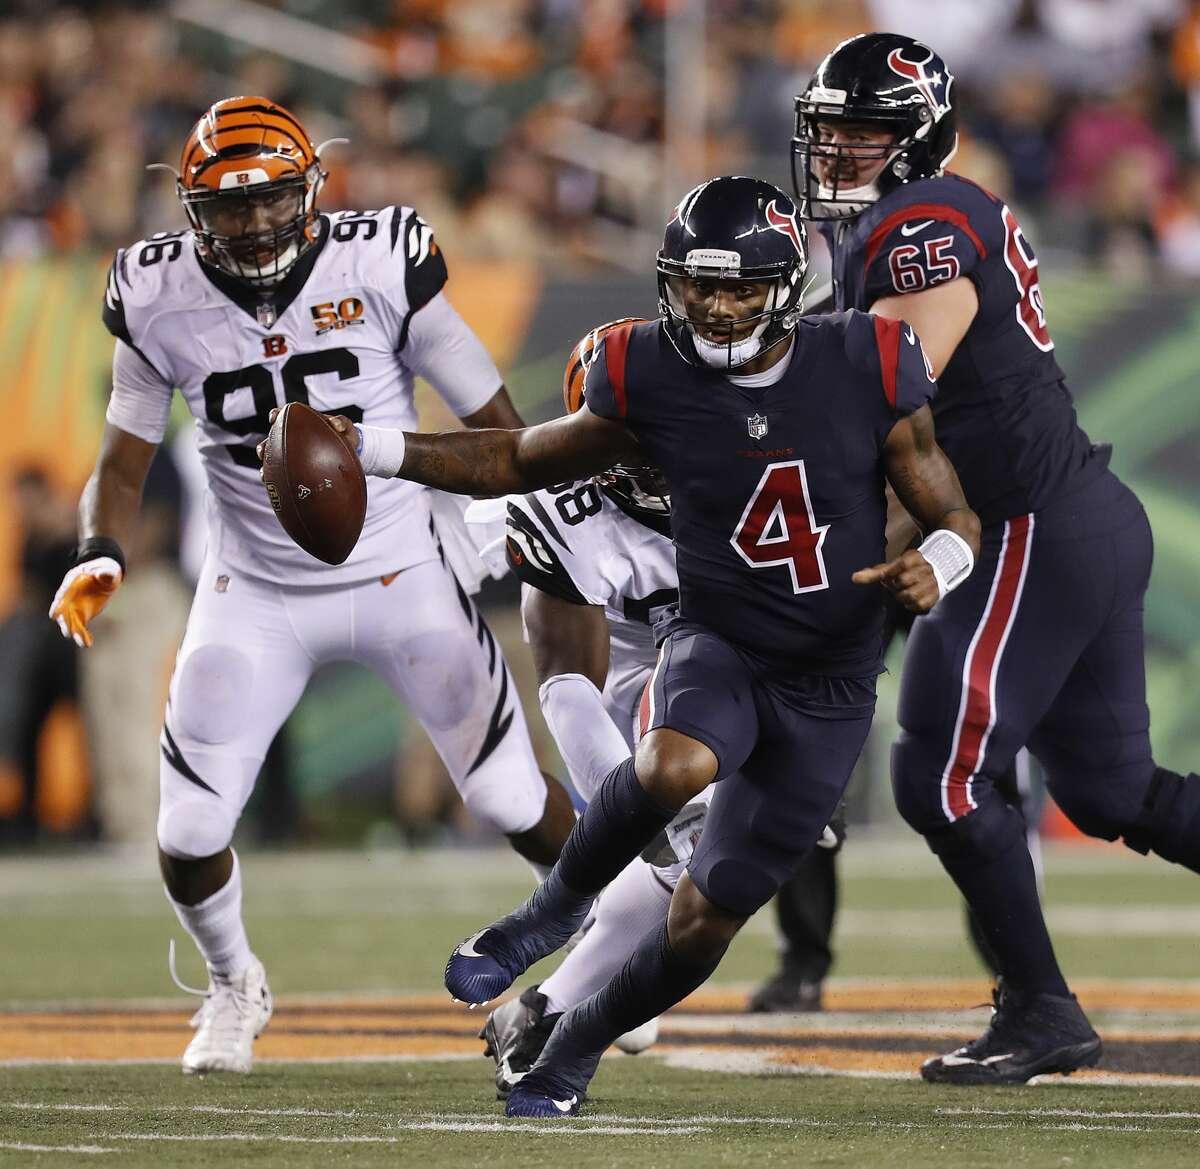 Houston Texans quarterback Deshaun Watson (4) scrambles during the foiurth quarter of an NFL football game at Paul Brown Stadium on Thursday, Sept. 14, 2017, in Cincinnati. ( Brett Coomer / Houston Chronicle )